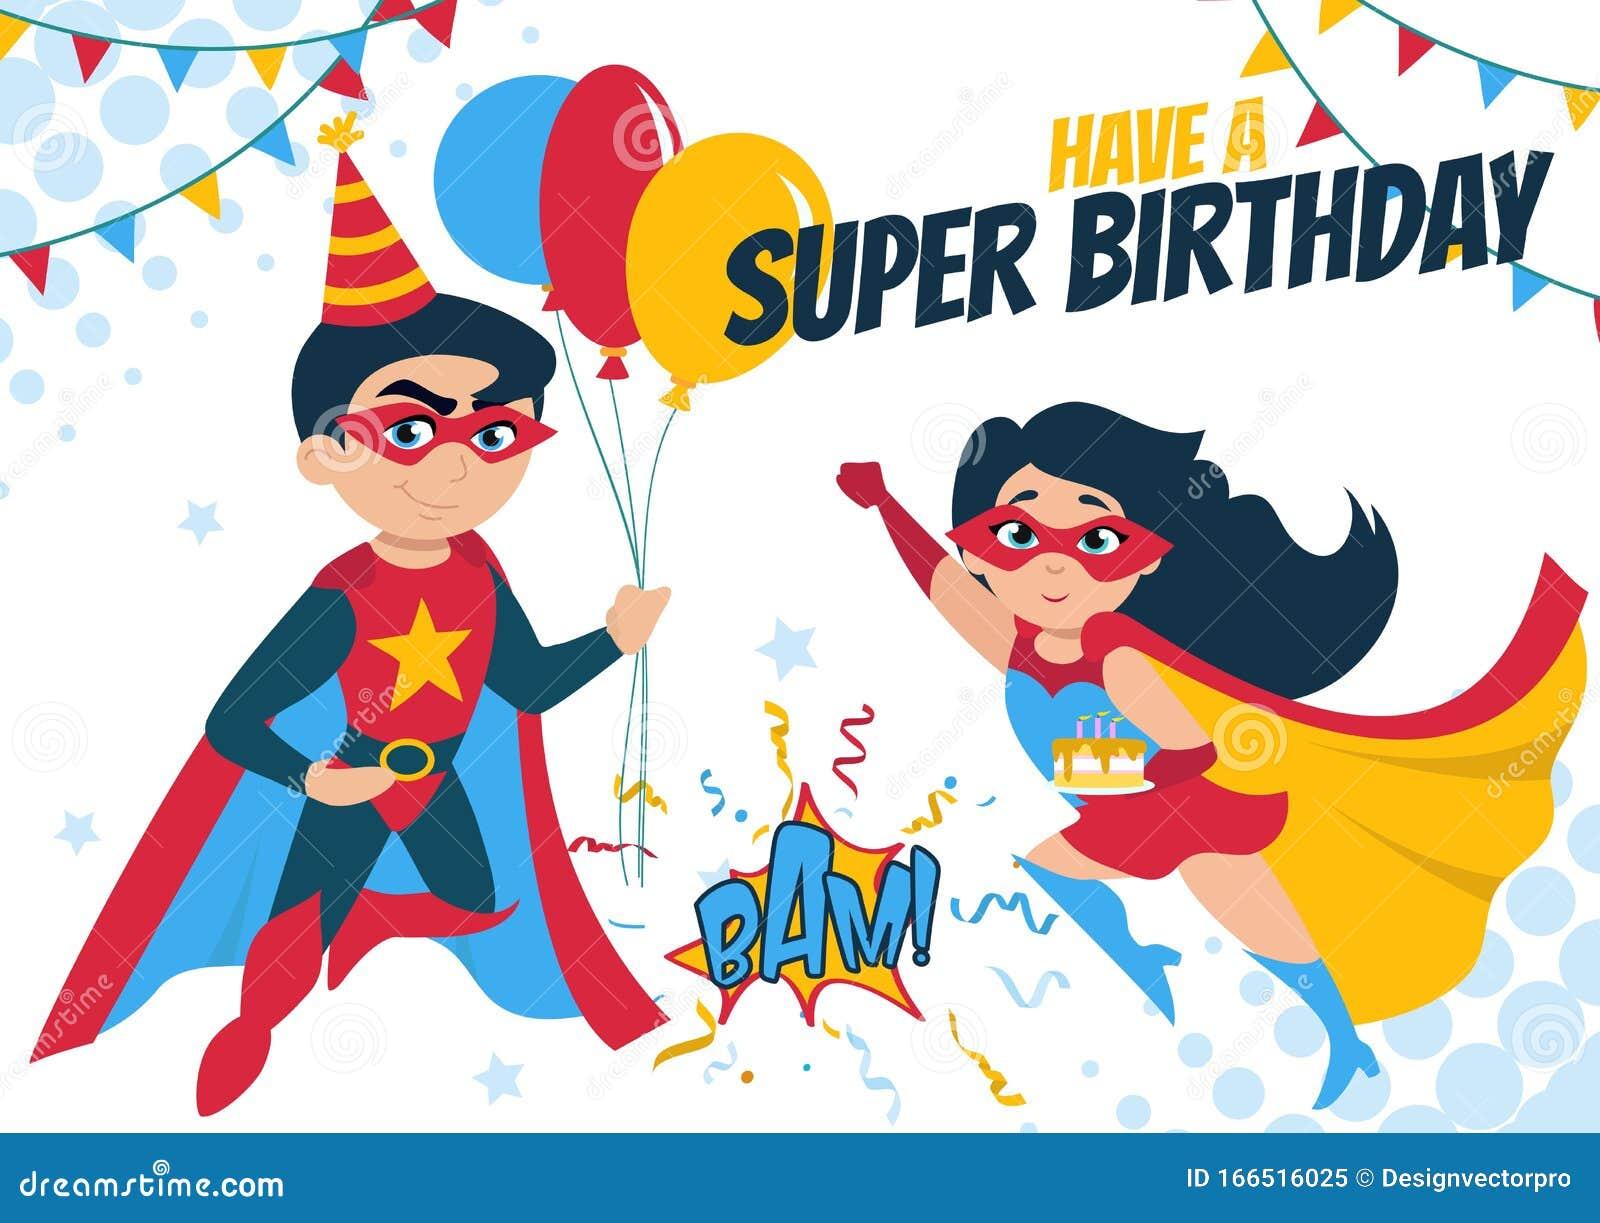 Superhero Birthday Cake Stock Illustrations – 21 Superhero Within Superman Birthday Card Template